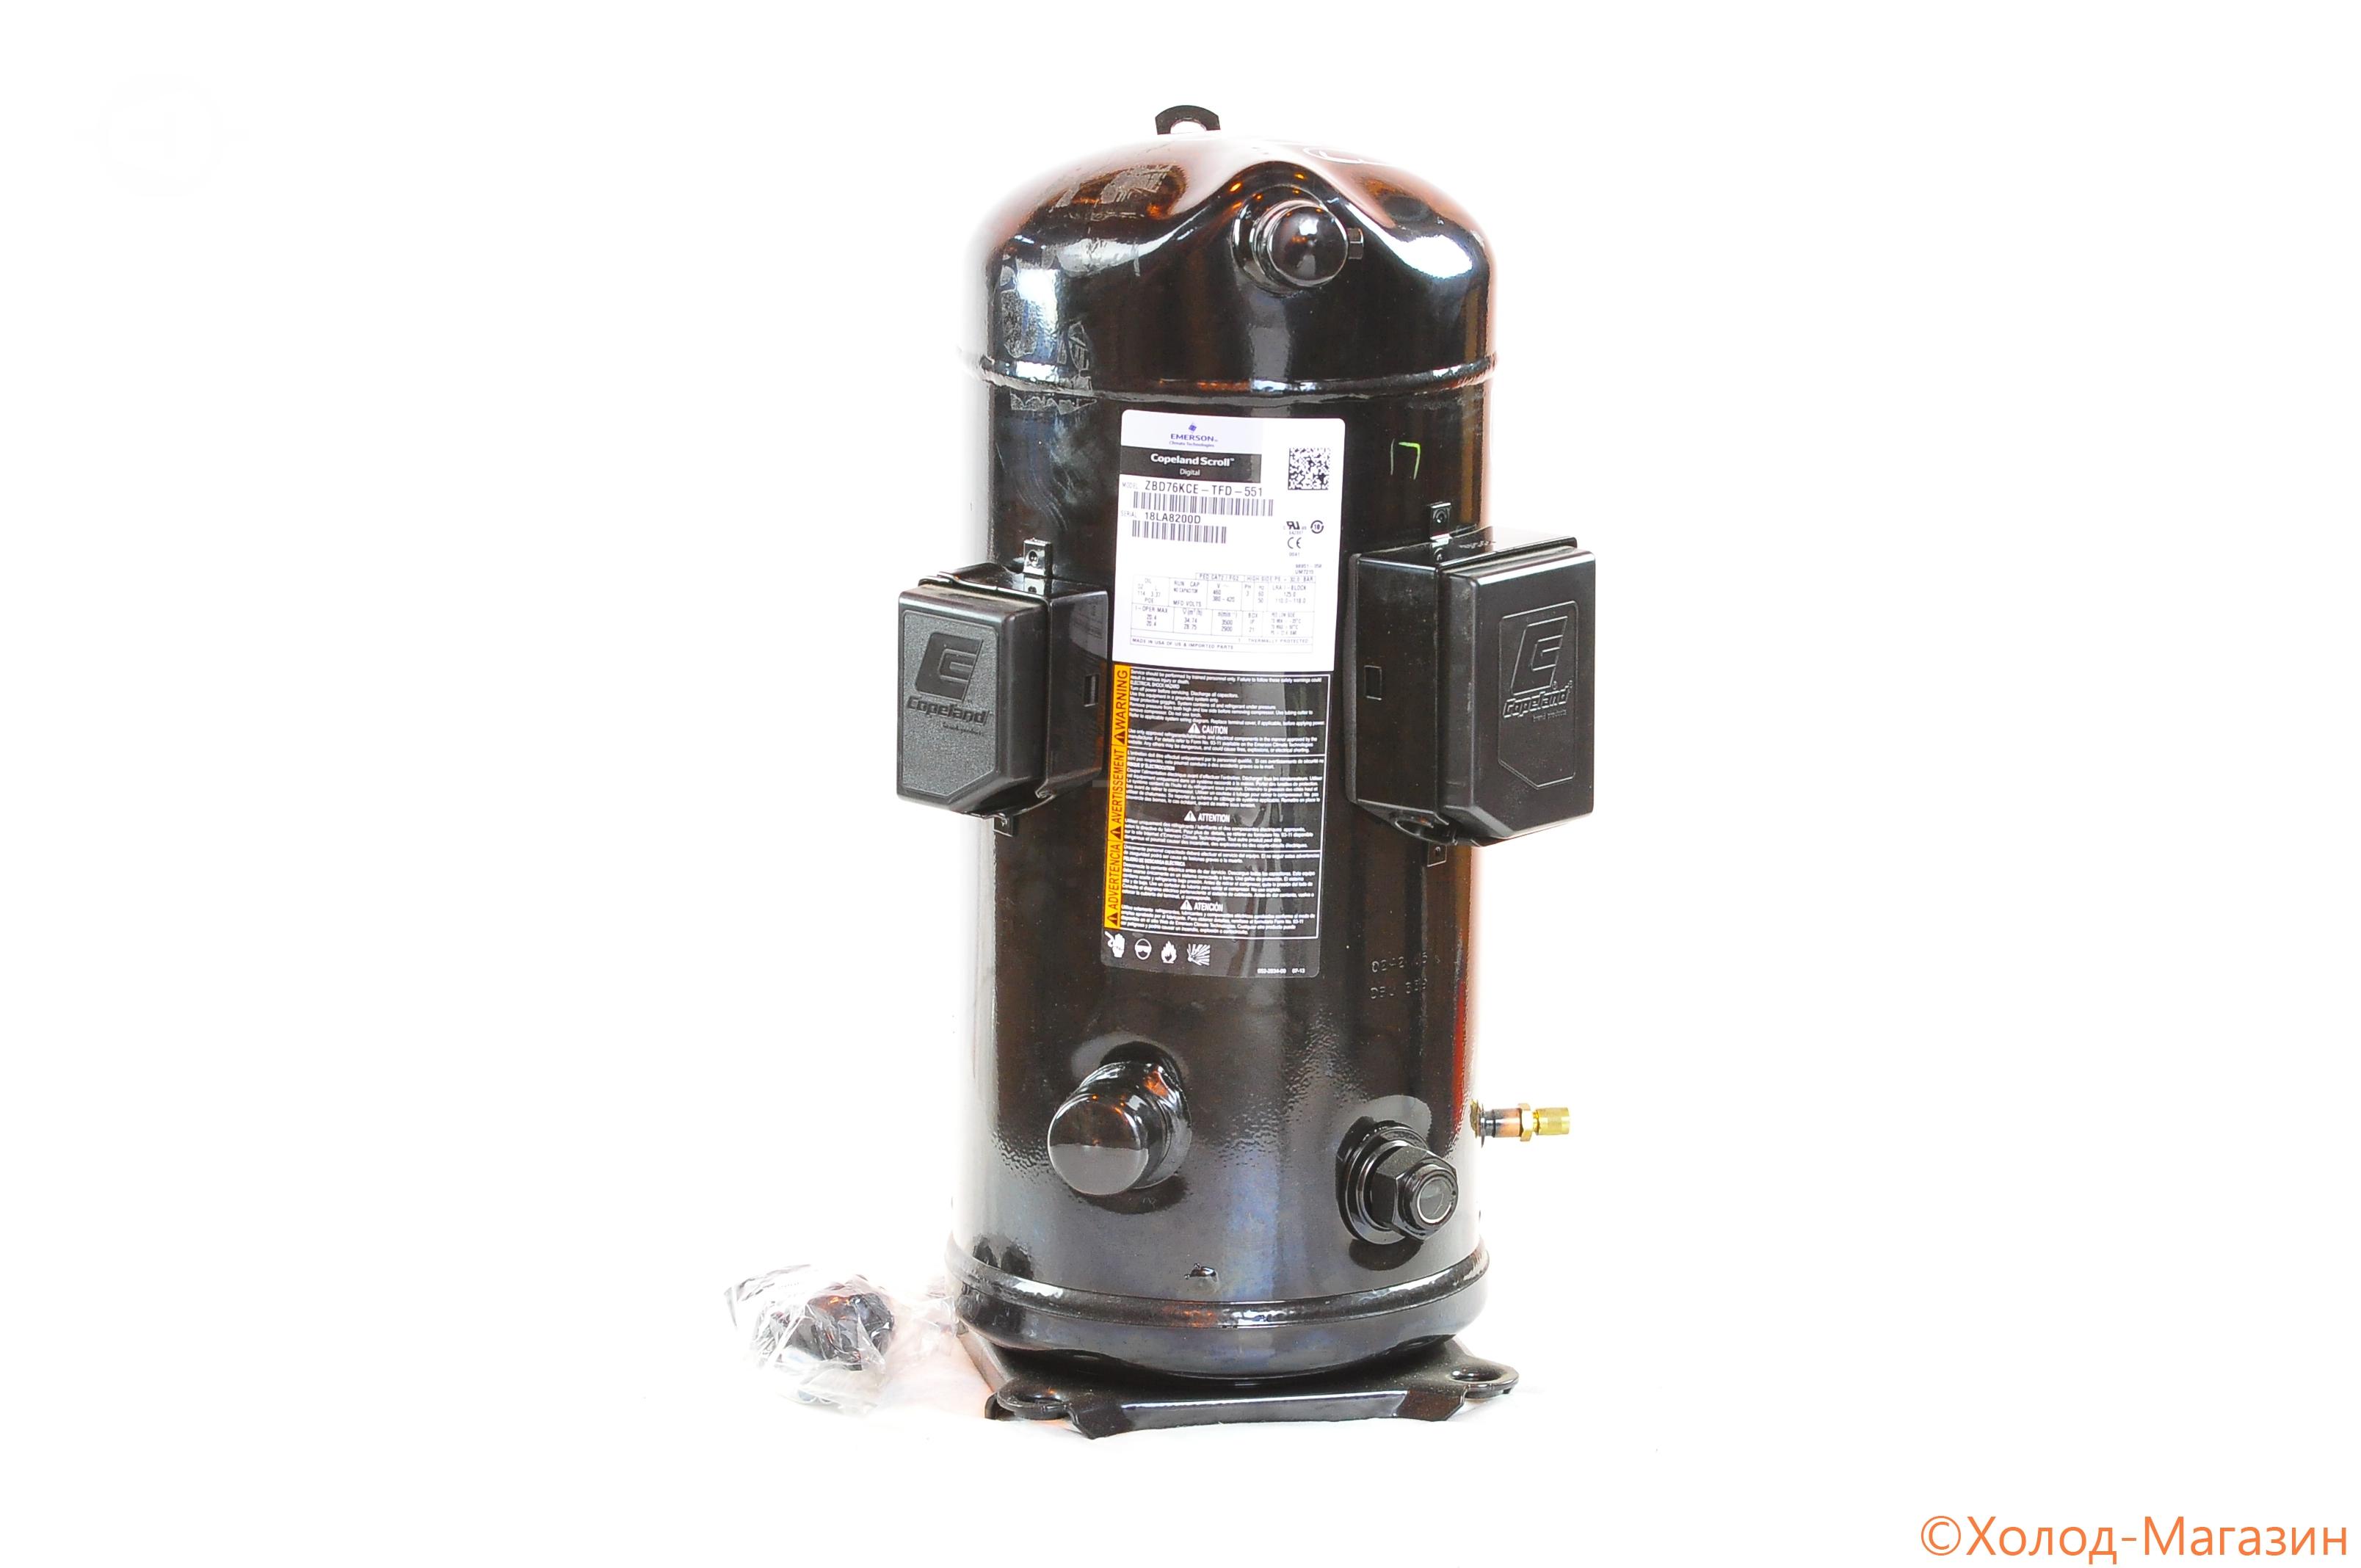 Компрессор спиральный ZBD 76 KCE-TFD-551 Copeland, Emerson